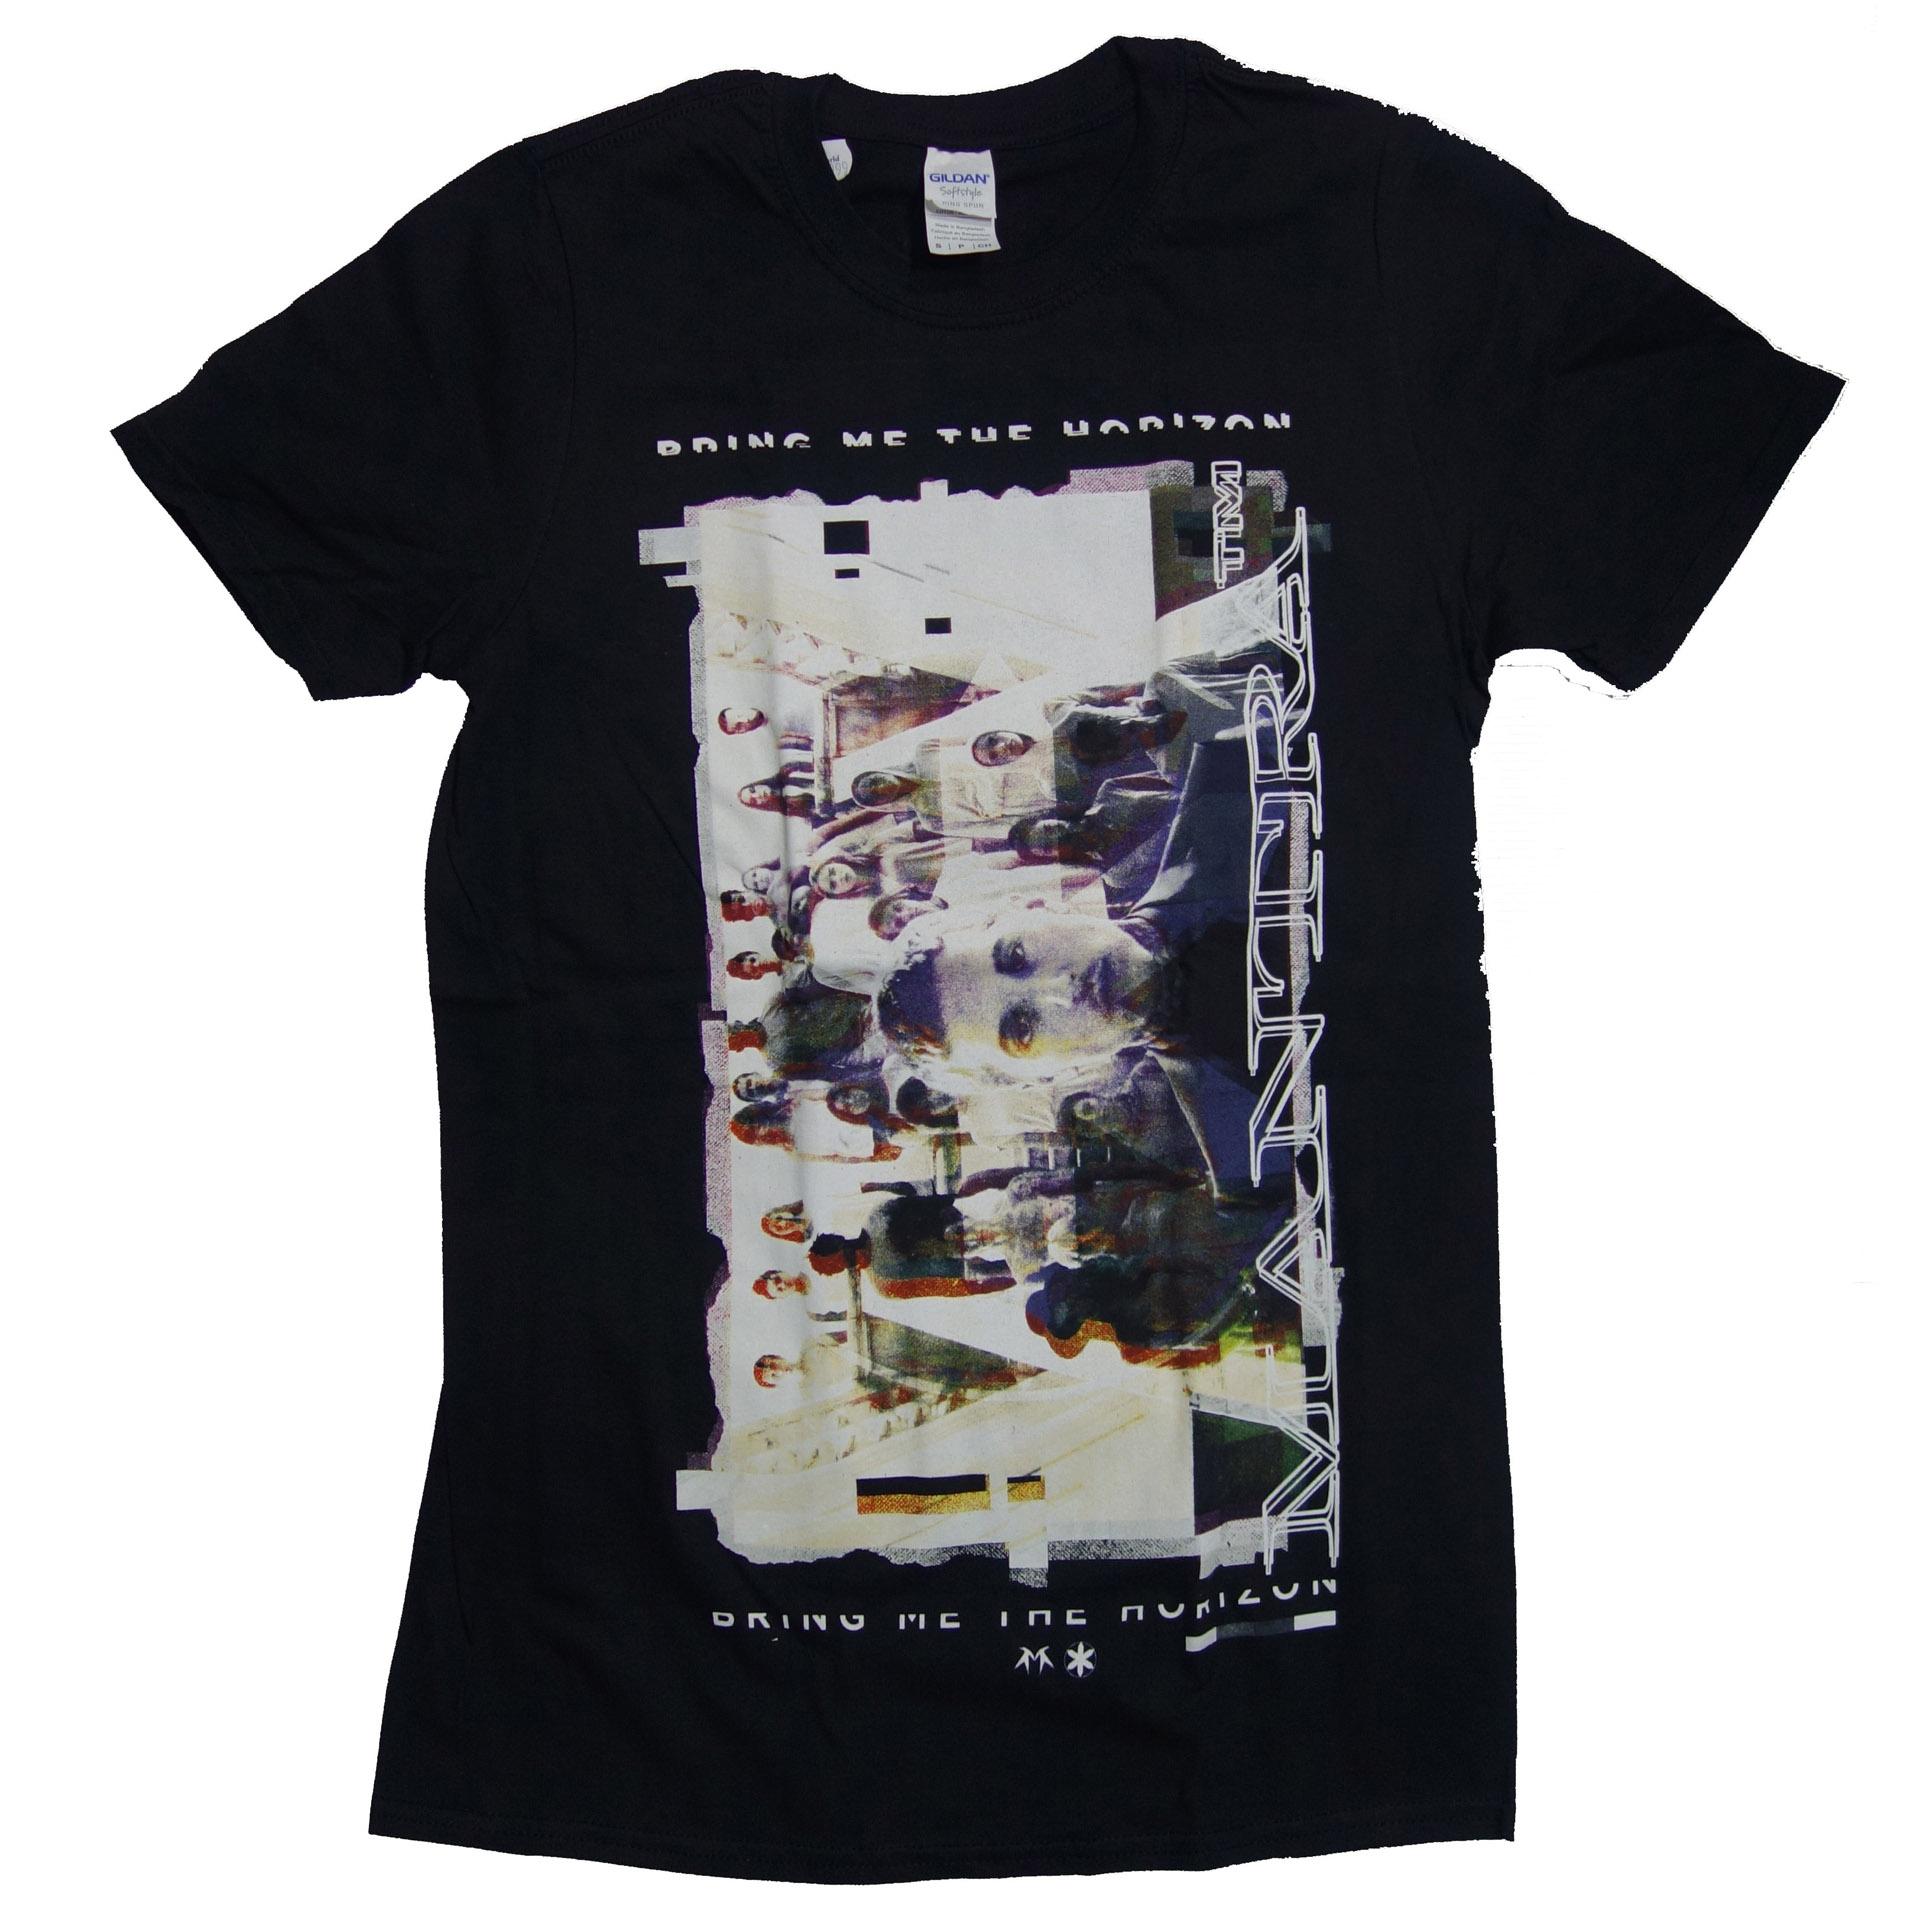 T-Shirt Bring Me The Horizon Mantra Cover